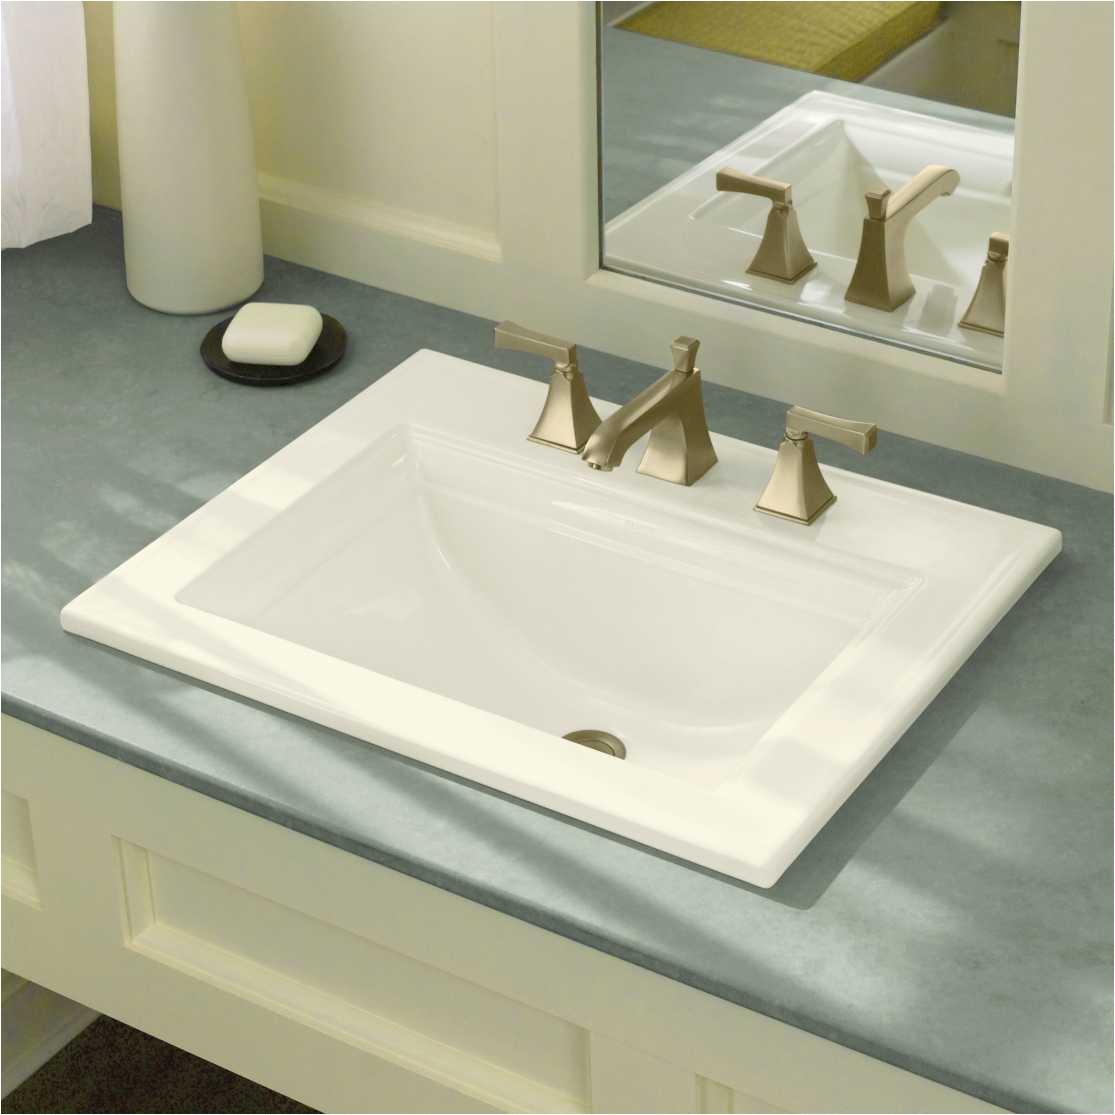 lowes bathroom sinks new aaa 1800x800h sink kohler bathroom toilets lowes 0d